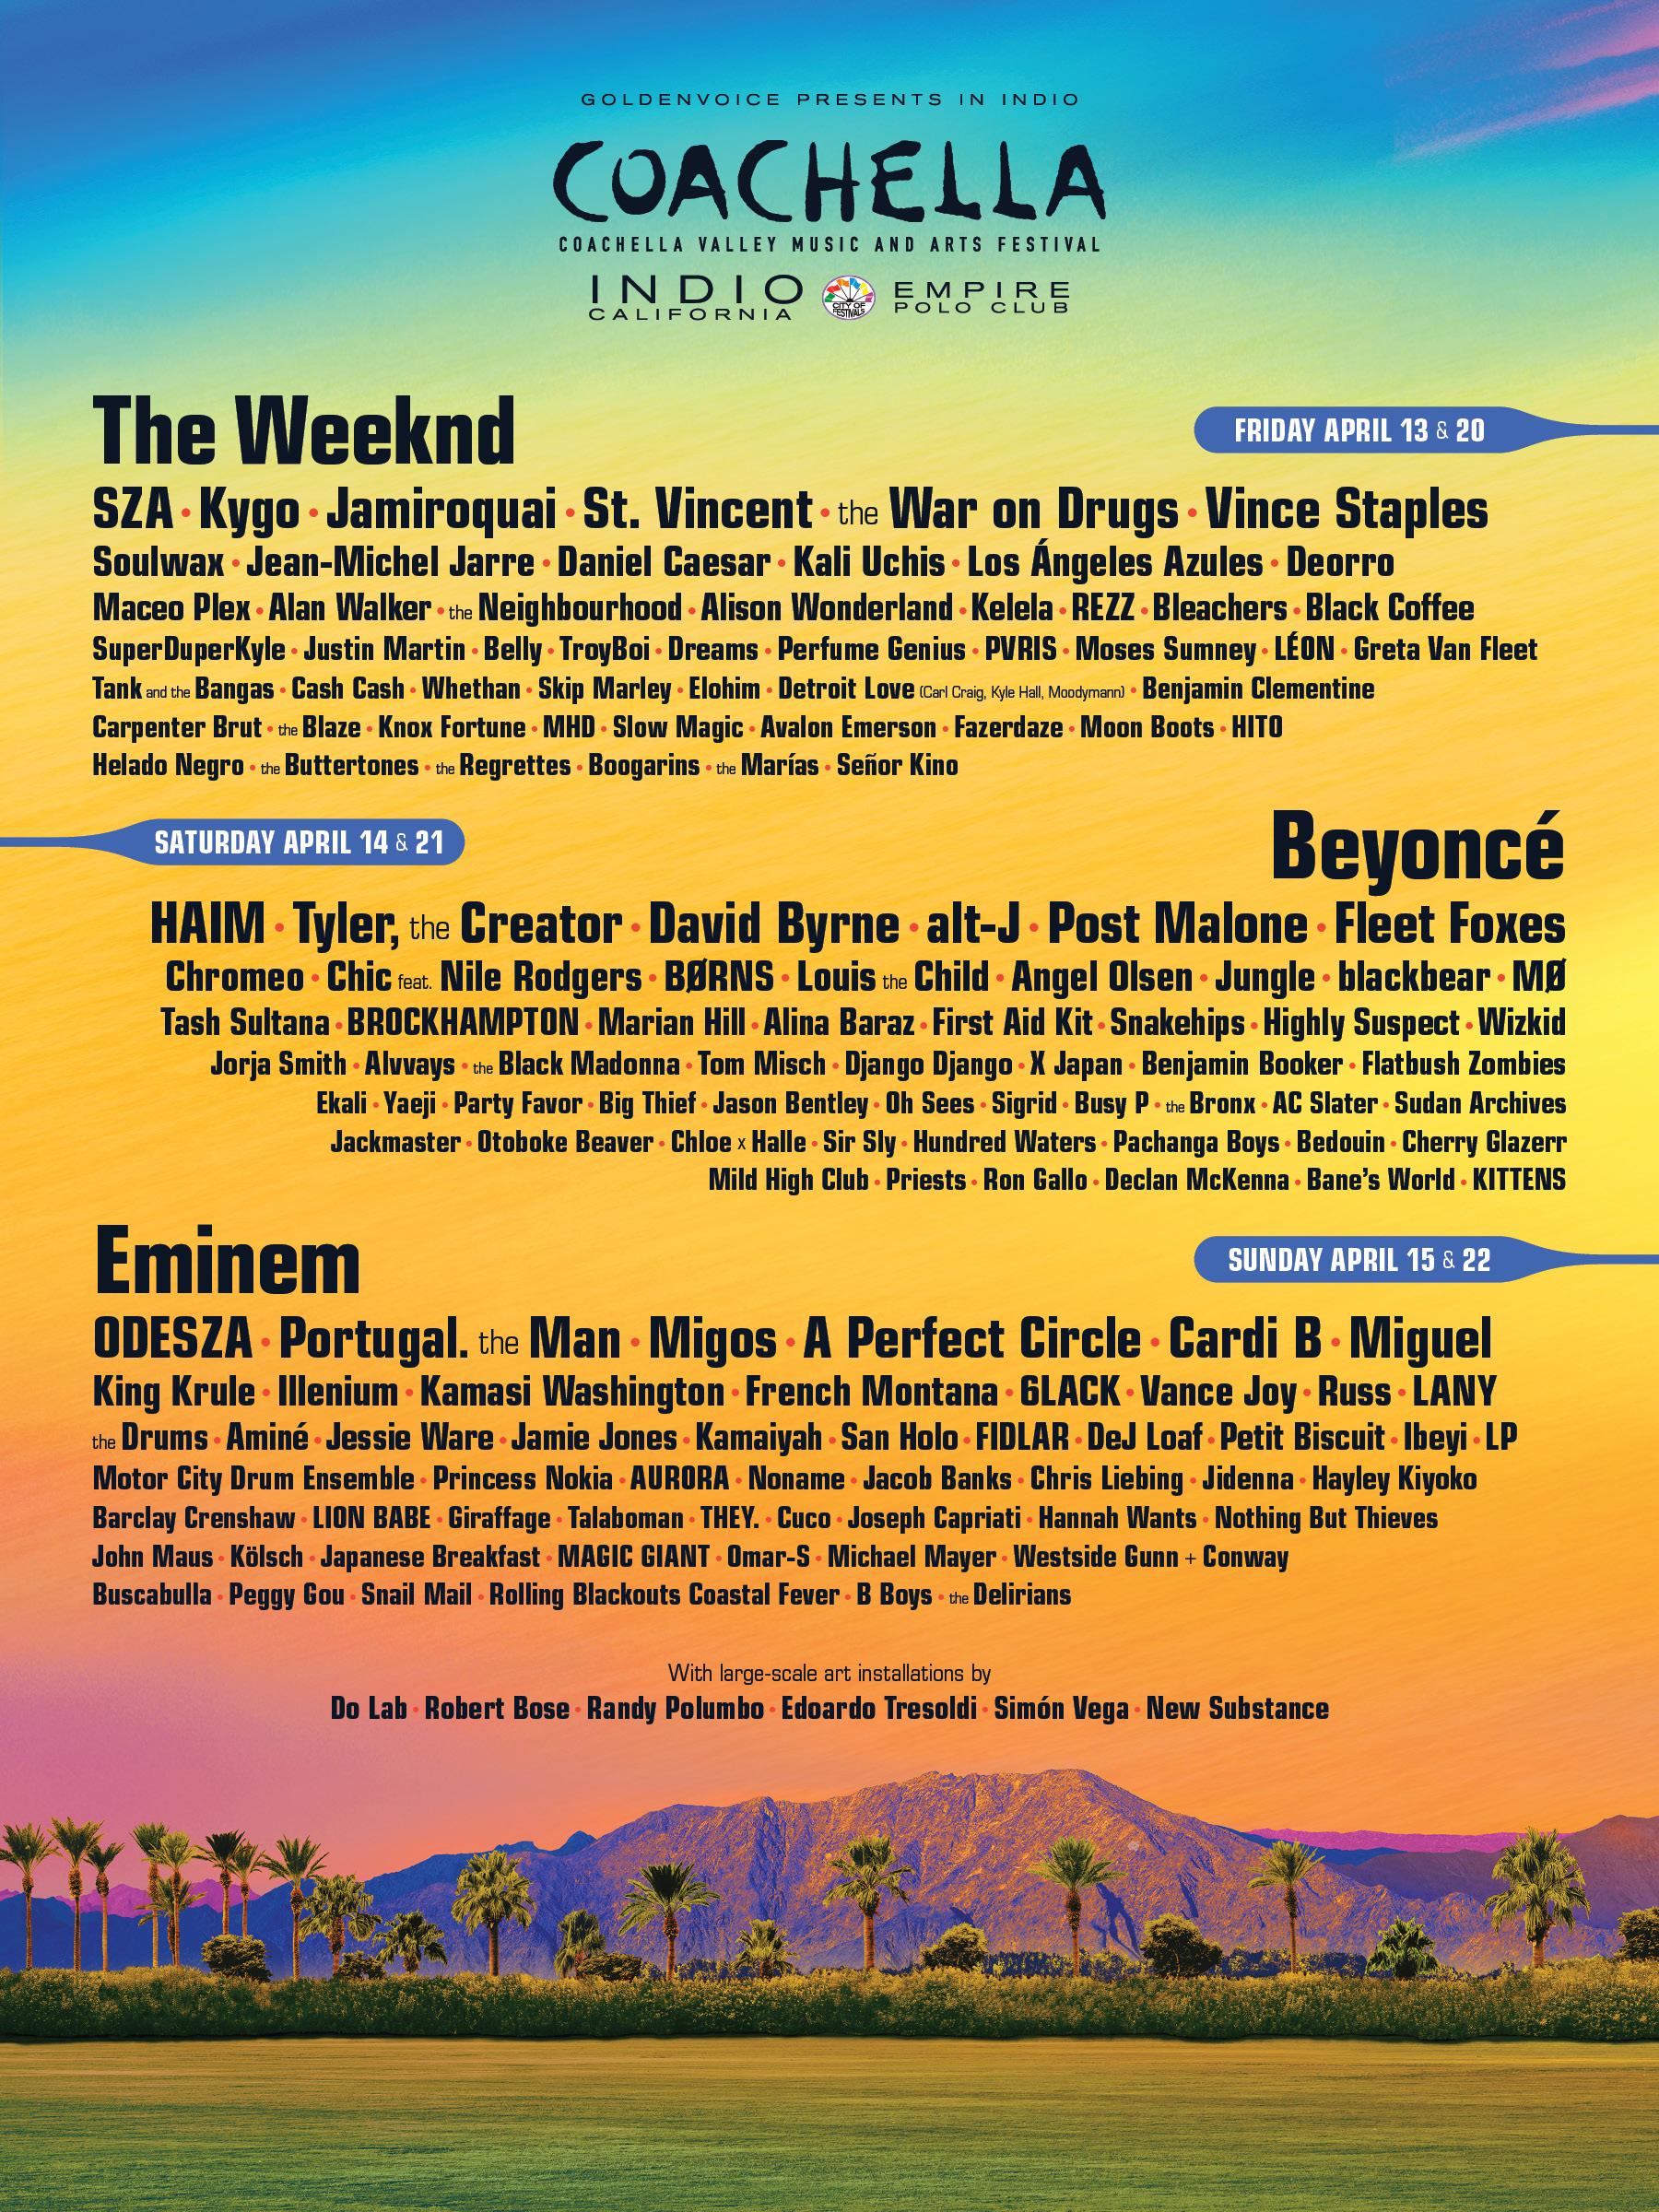 Cartel de Coachella